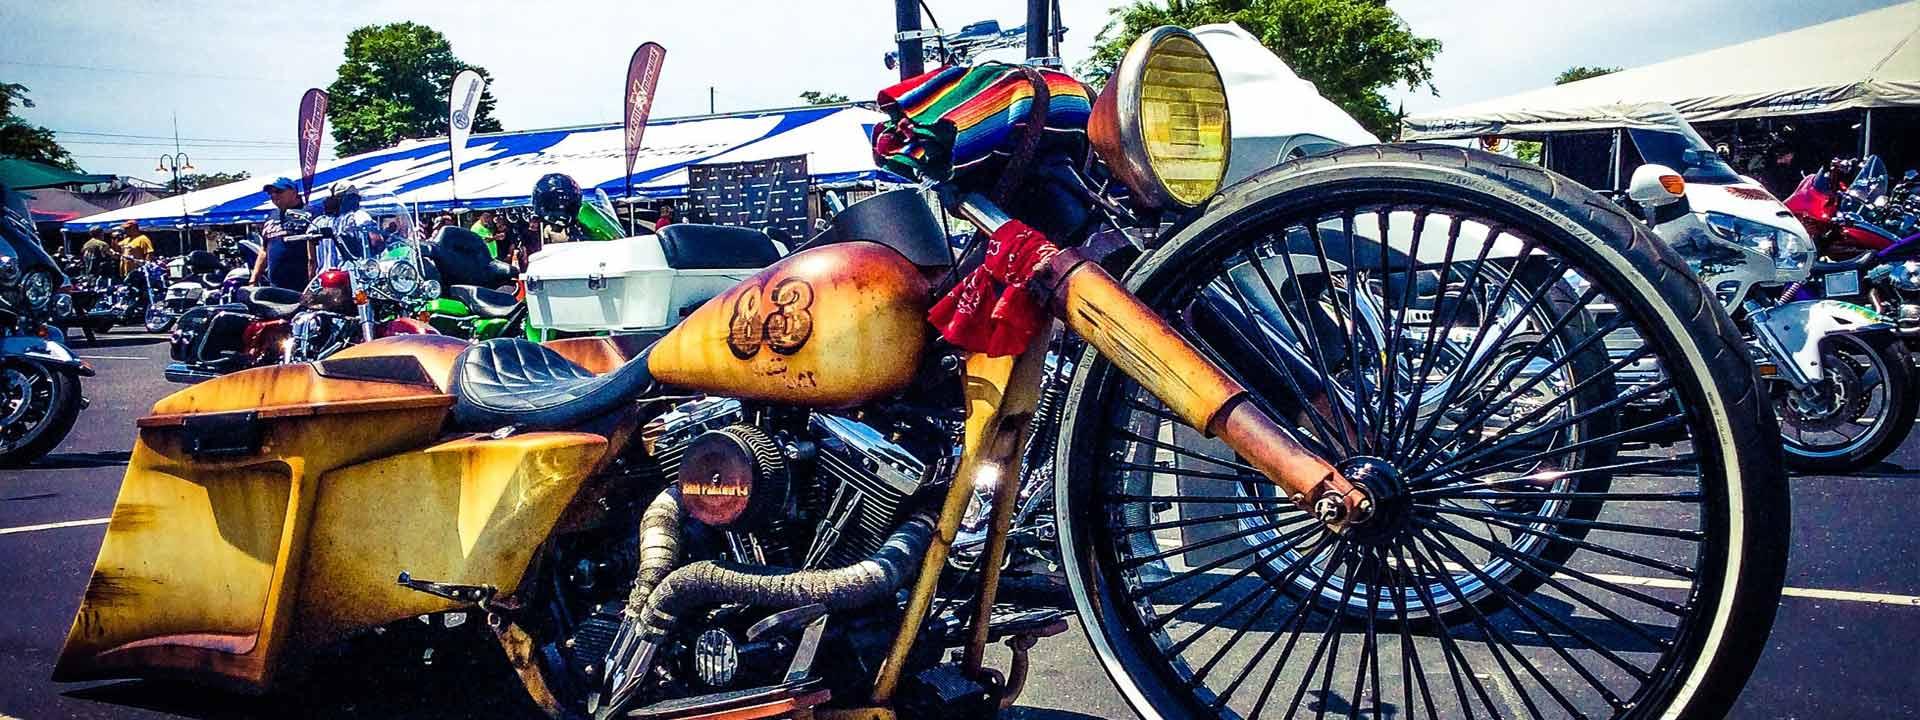 Myrtle Beach Bike Week 2020